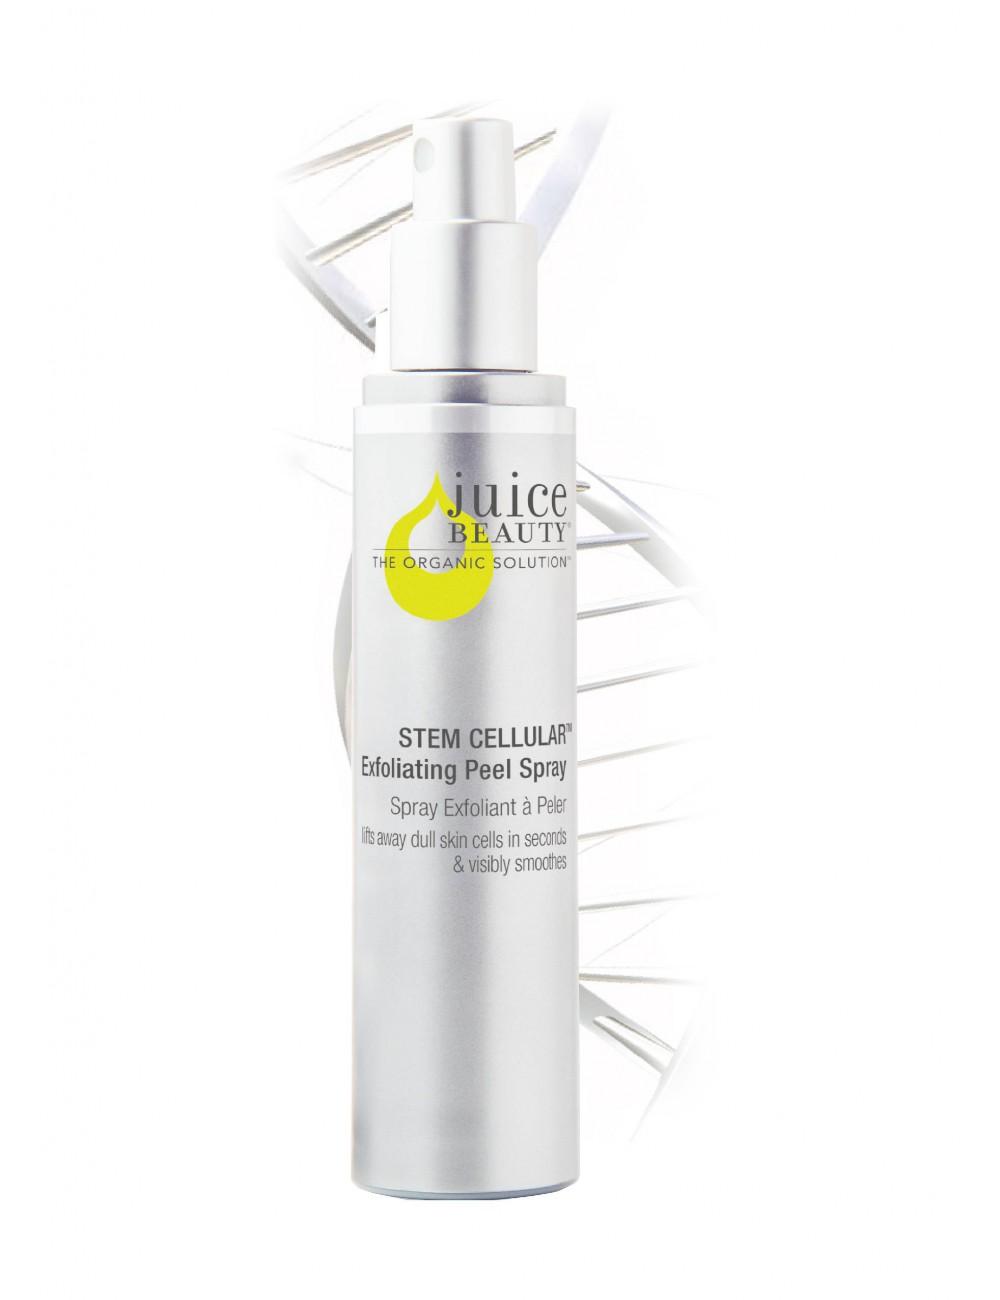 Juice Beauty STEM CELLULAR™  Exfoliating Peel Spray 50ml